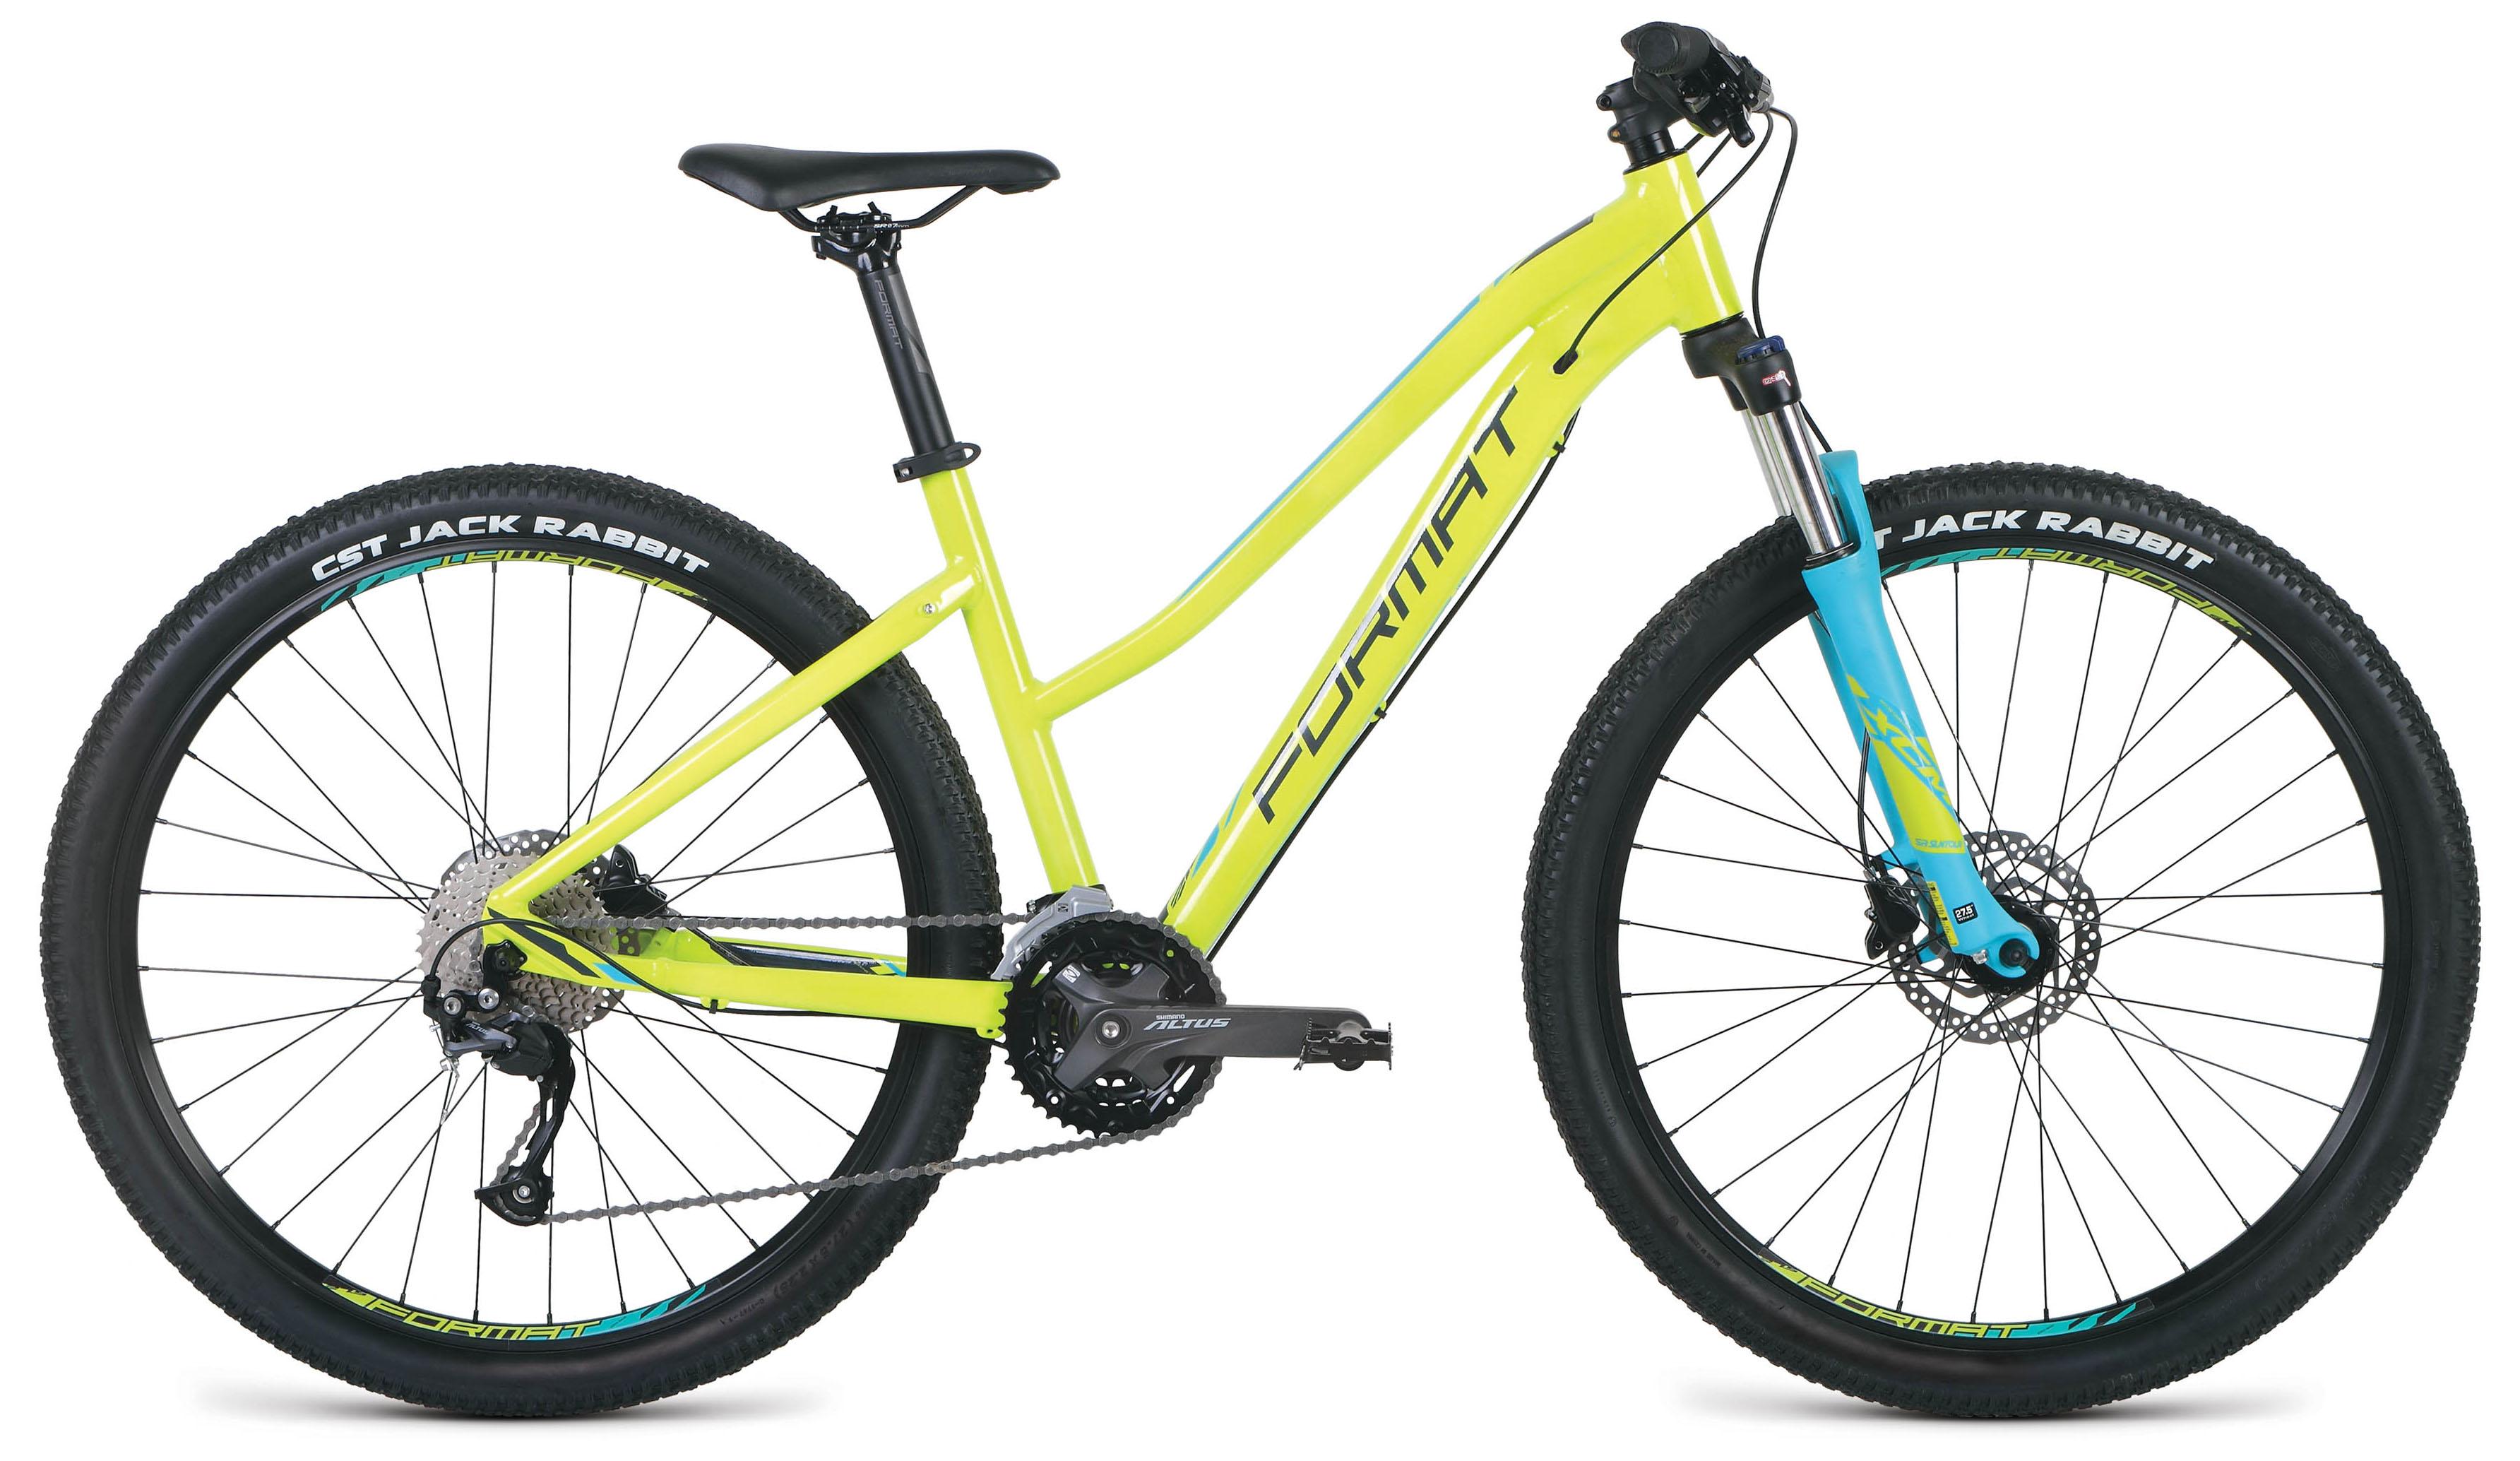 цена Велосипед Format 7712 27,5 2019